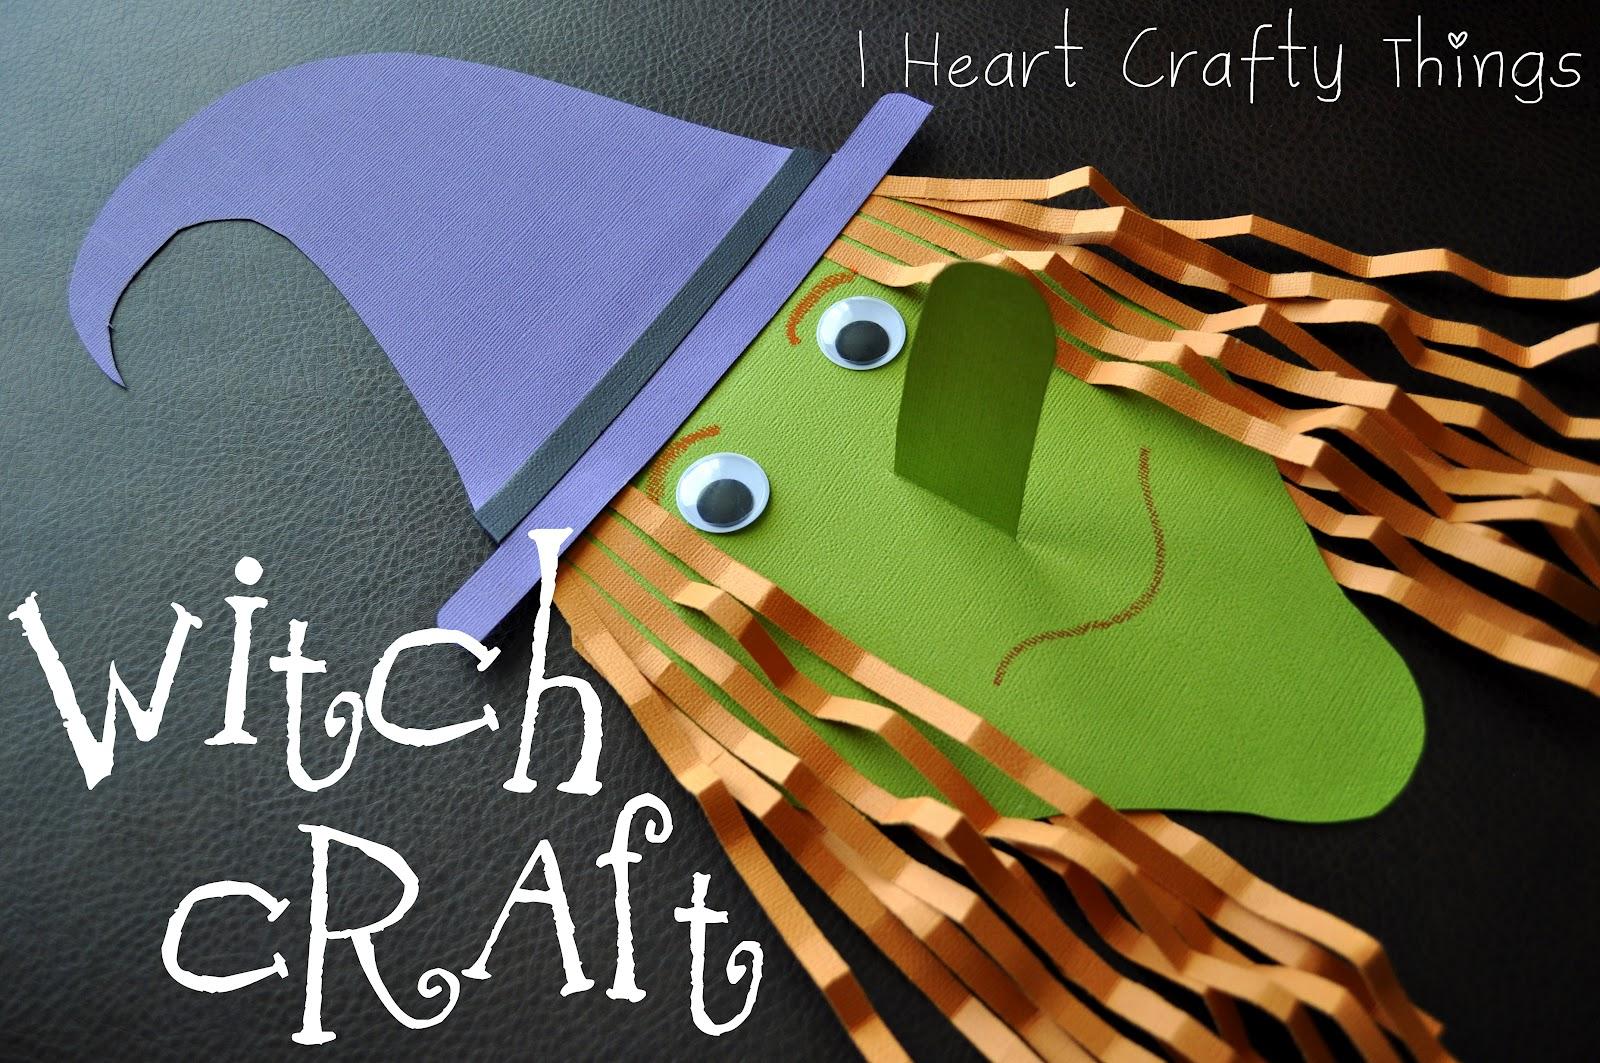 Witch craft i heart crafty things witch craft jeuxipadfo Choice Image